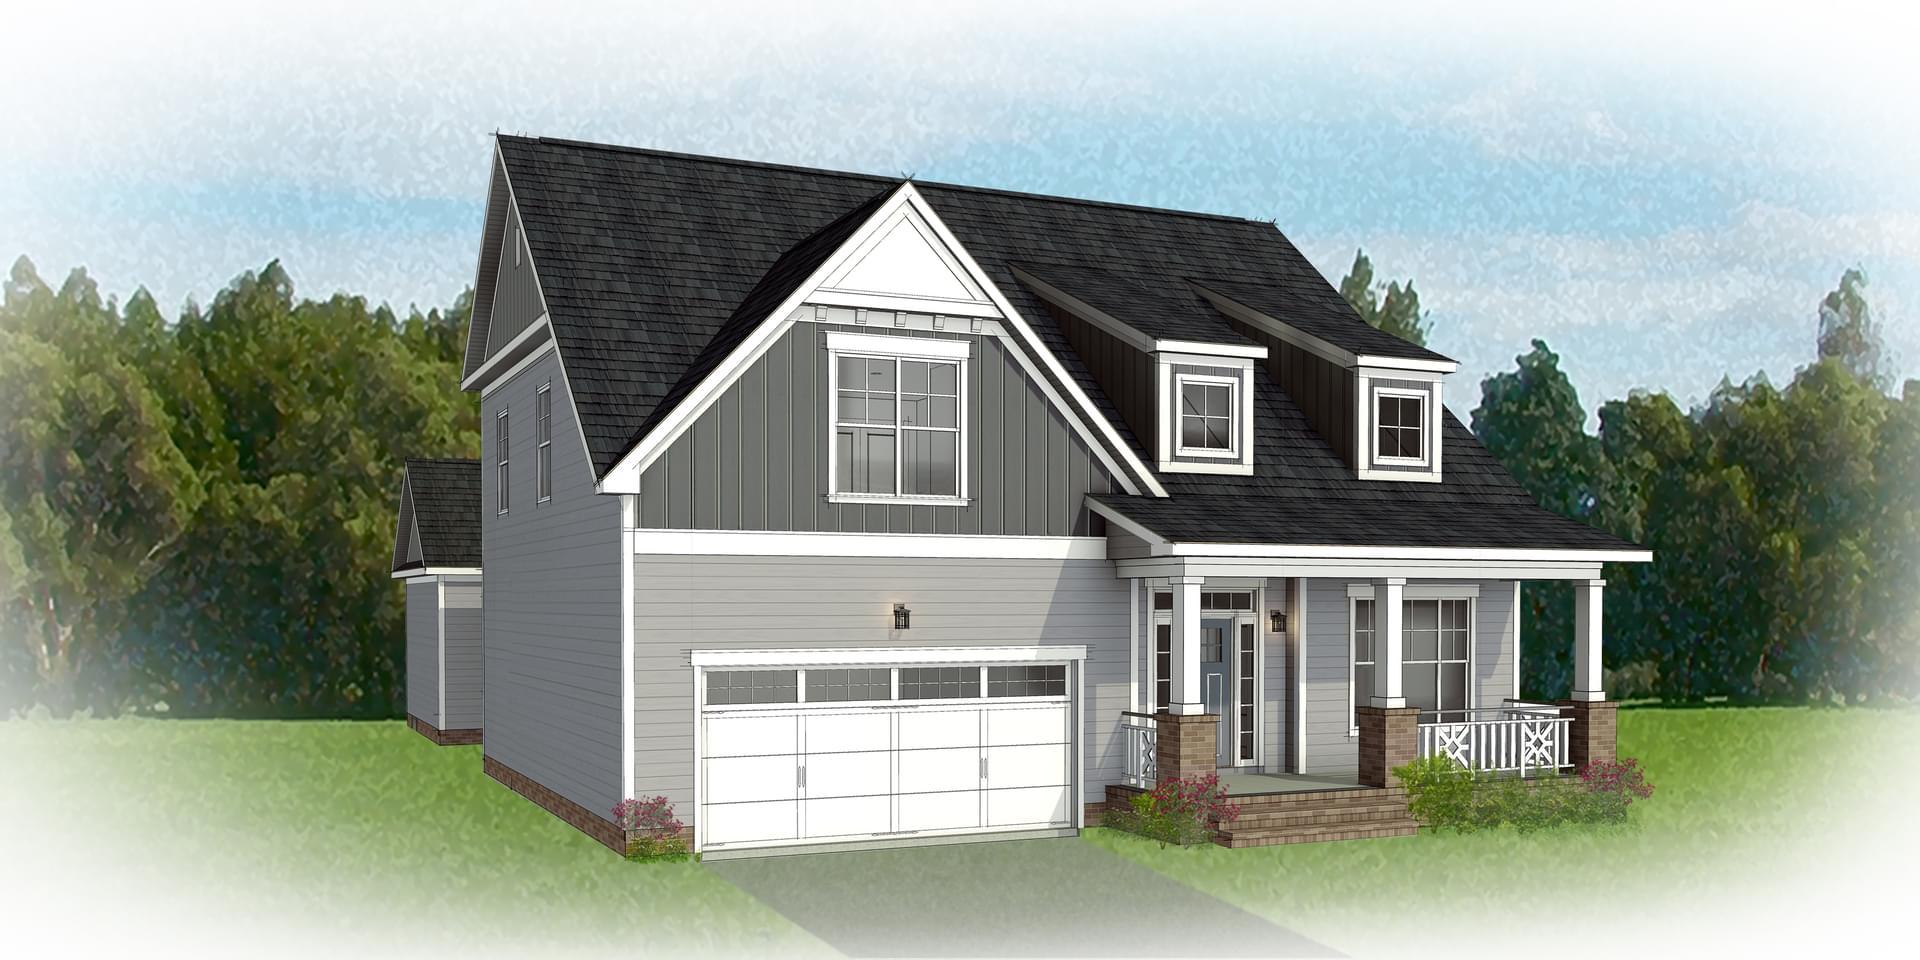 The Carlisle new home in Blacksburg VA